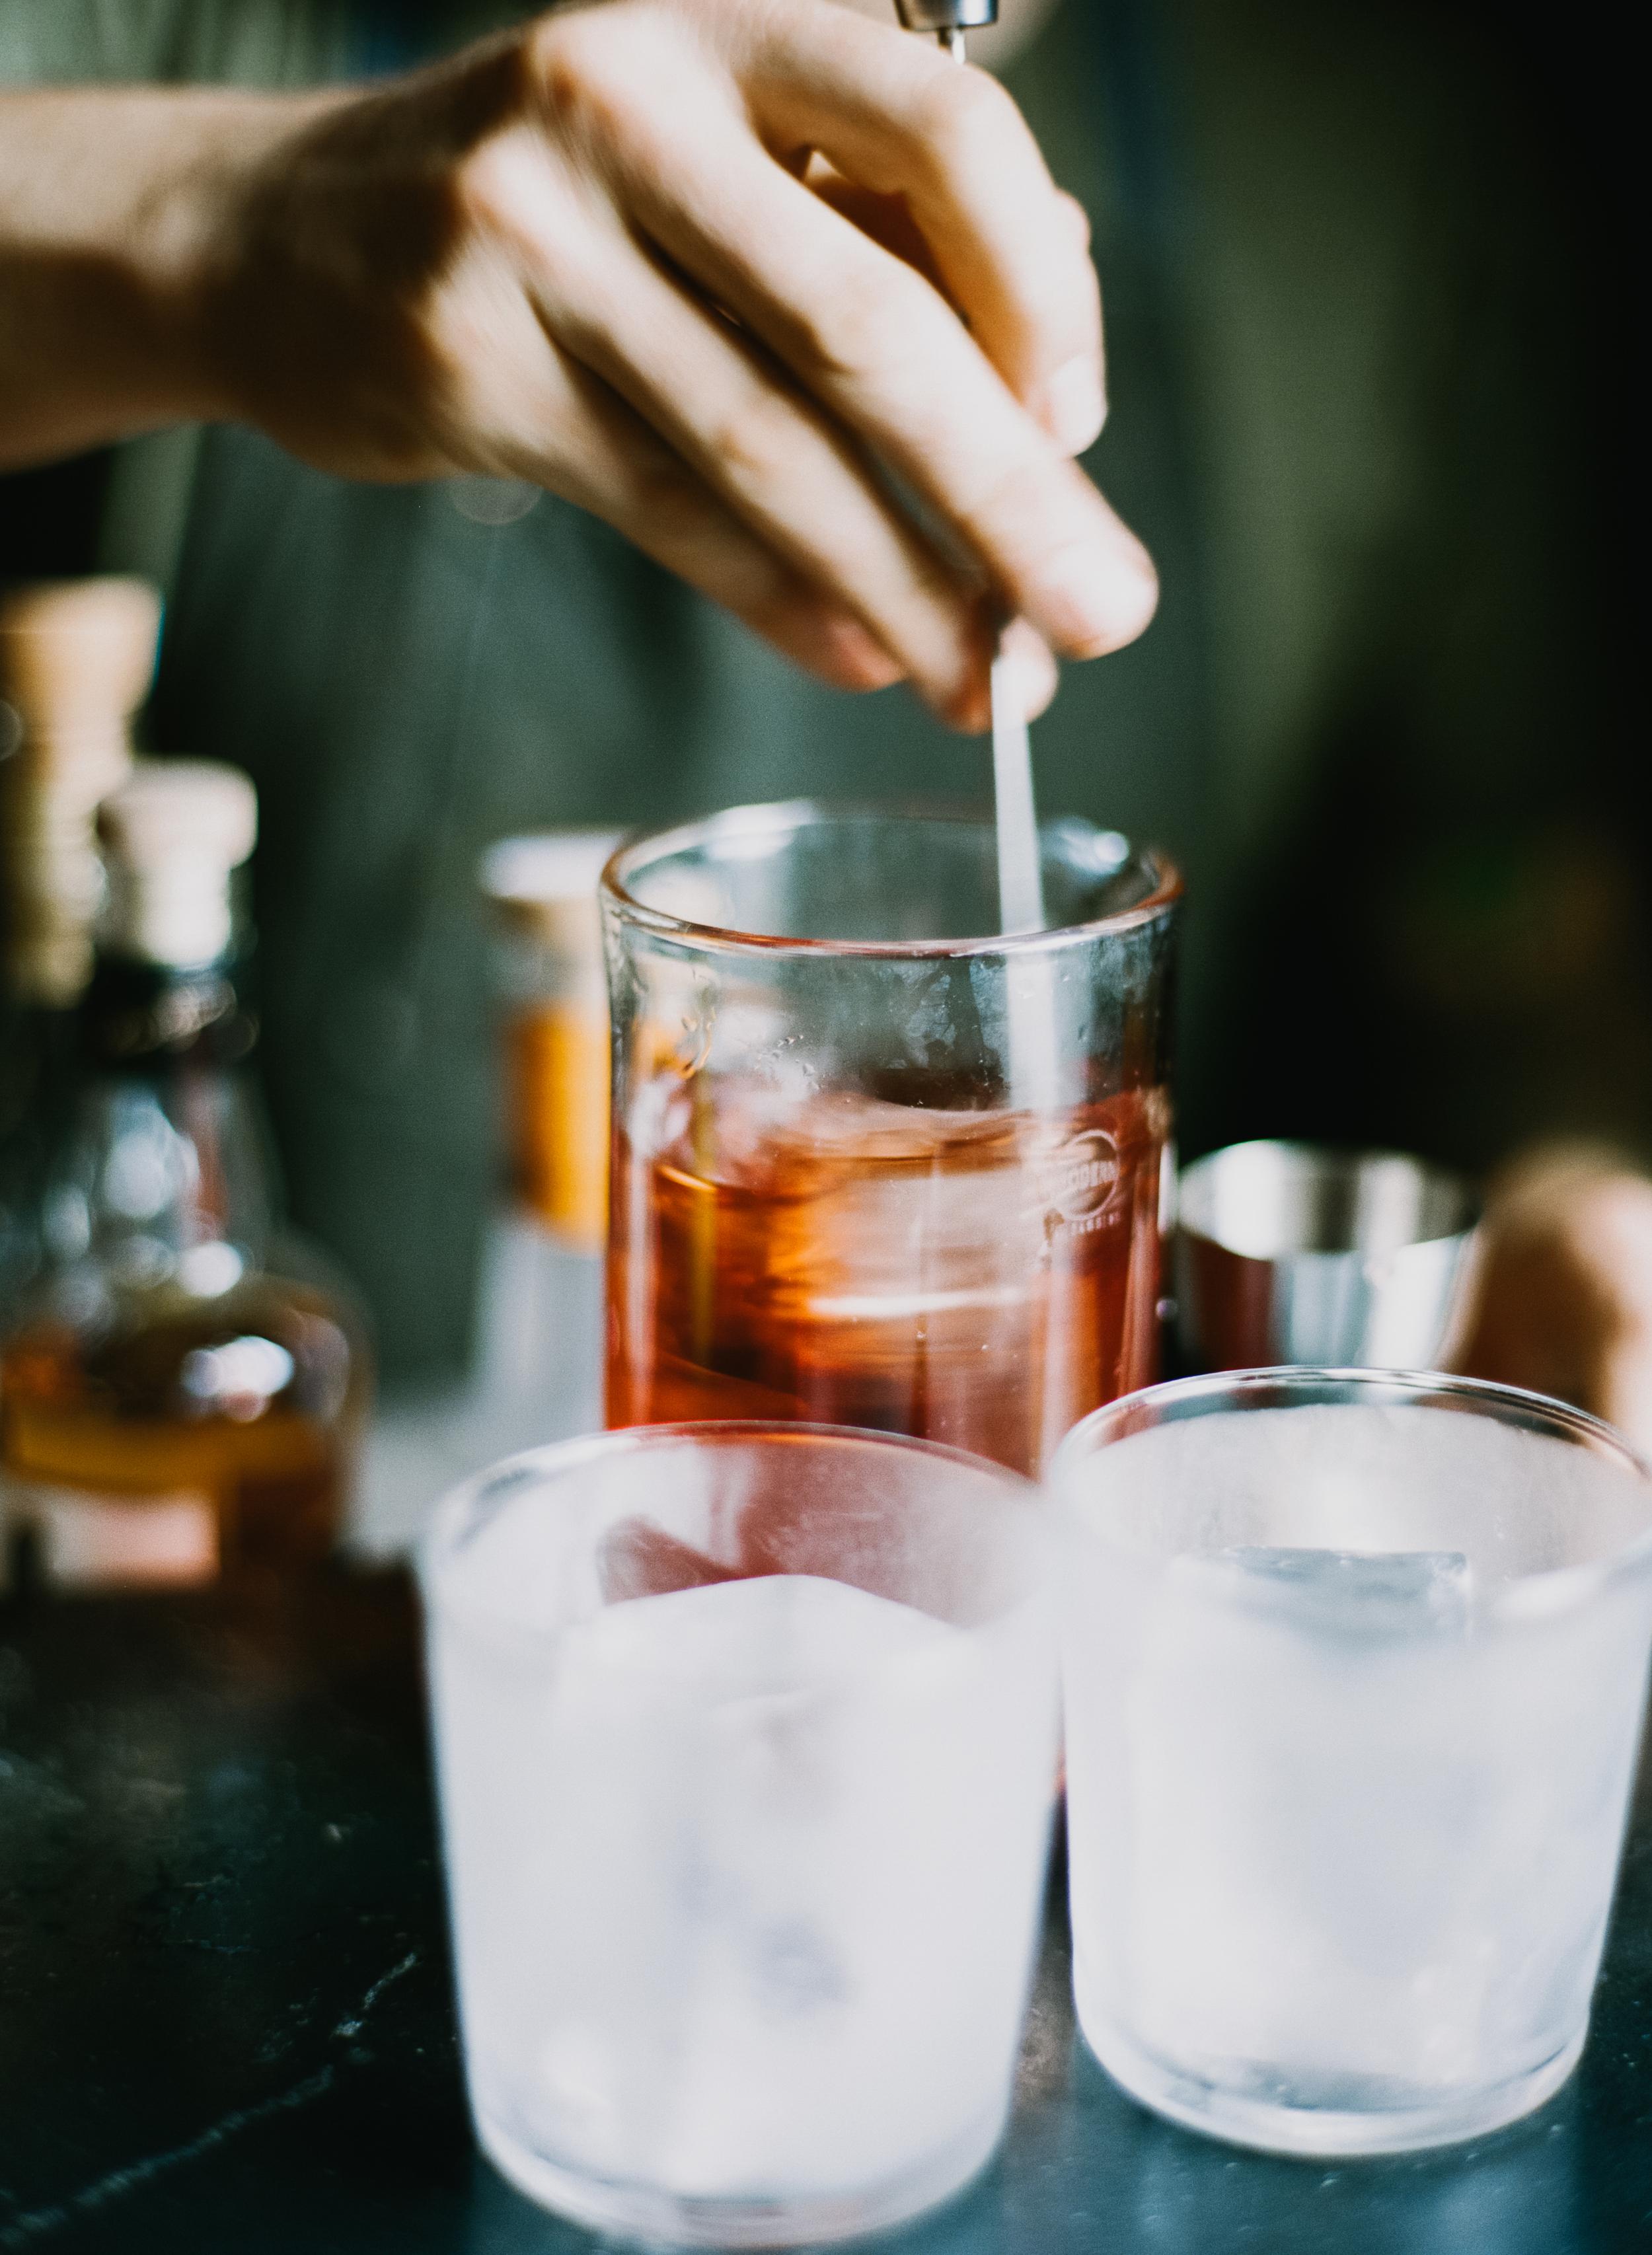 TrickDog_Bar_San_Francisco_City_Guide_Drinks_Cocktails_Lifestyle_Zack_Arp-756.jpg